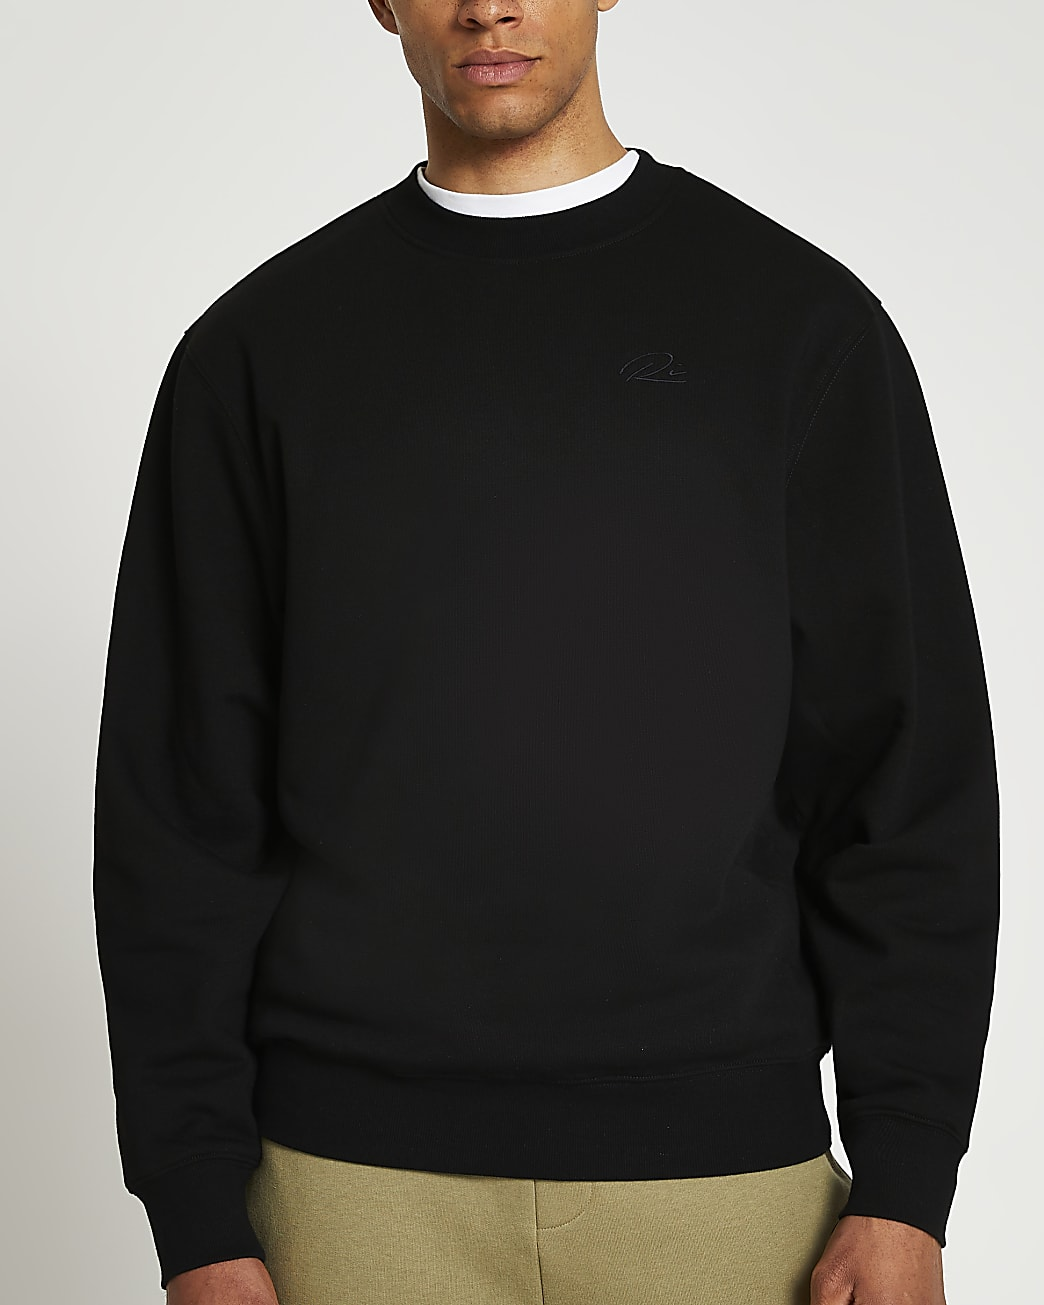 Black RI embroidered regular fit sweatshirt